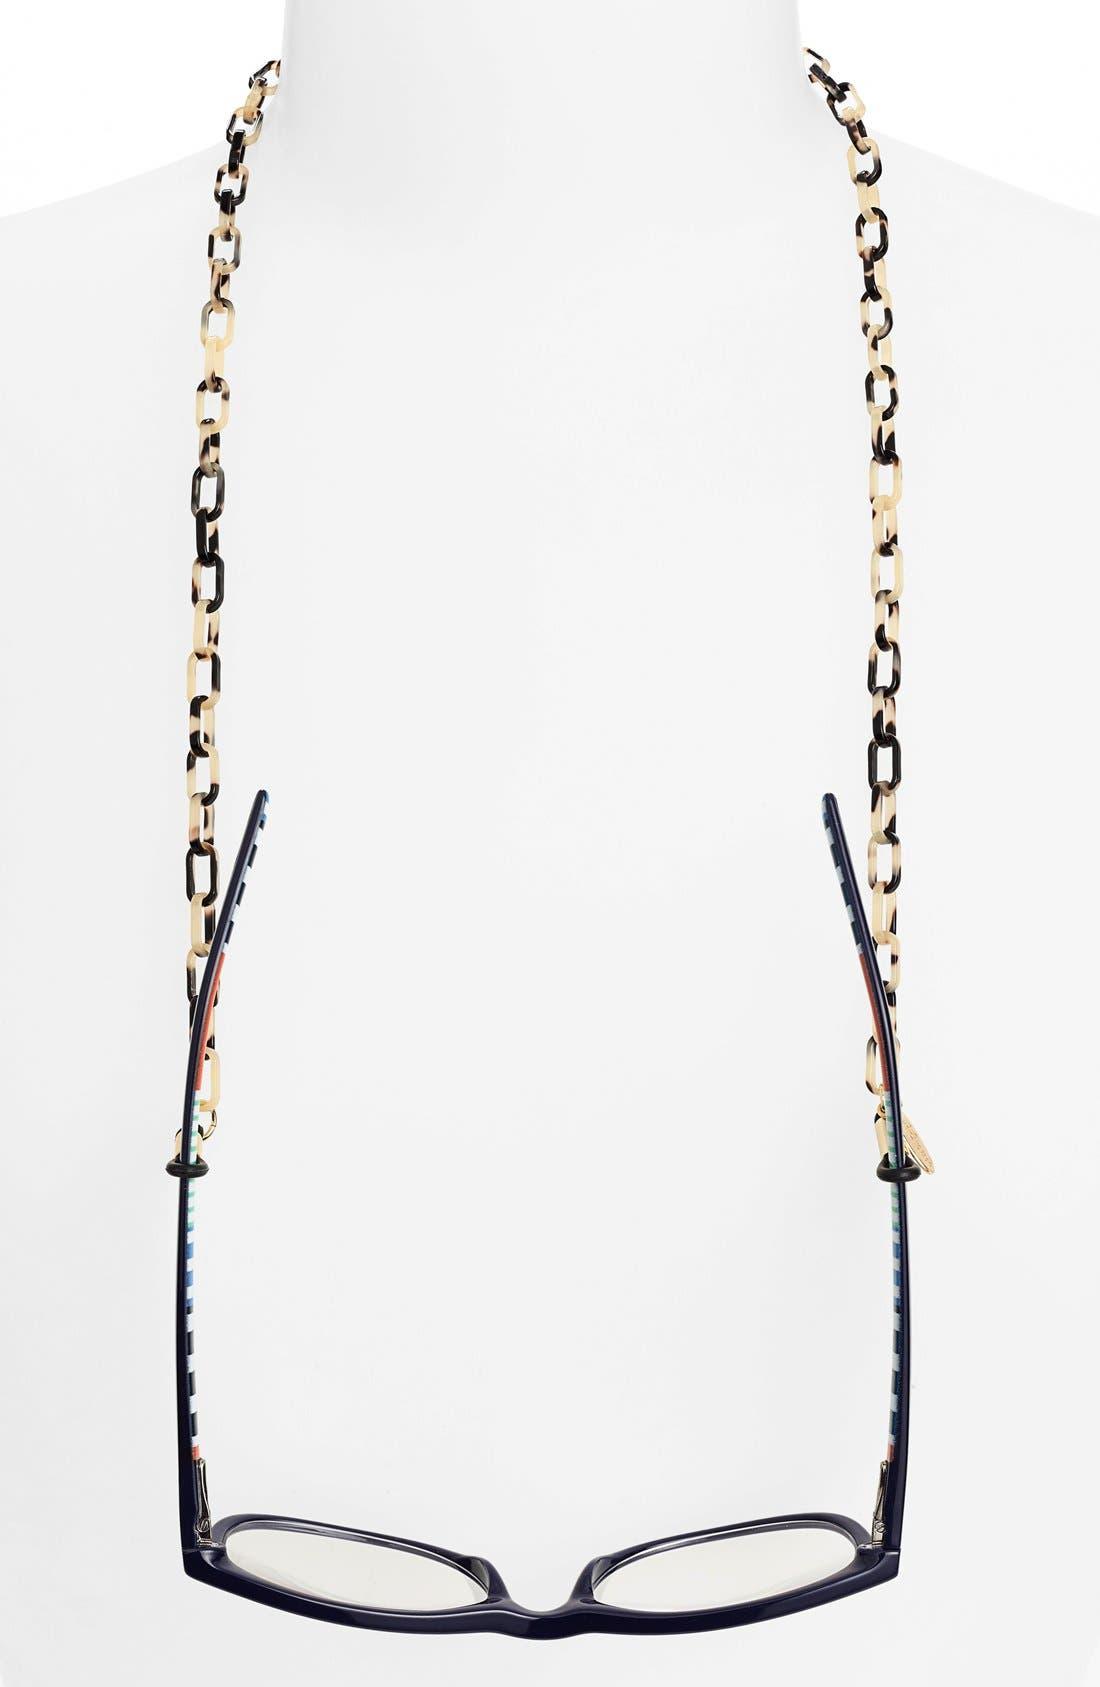 L. Erickson 'Demi' Mini Oval Link Eyewear Chain